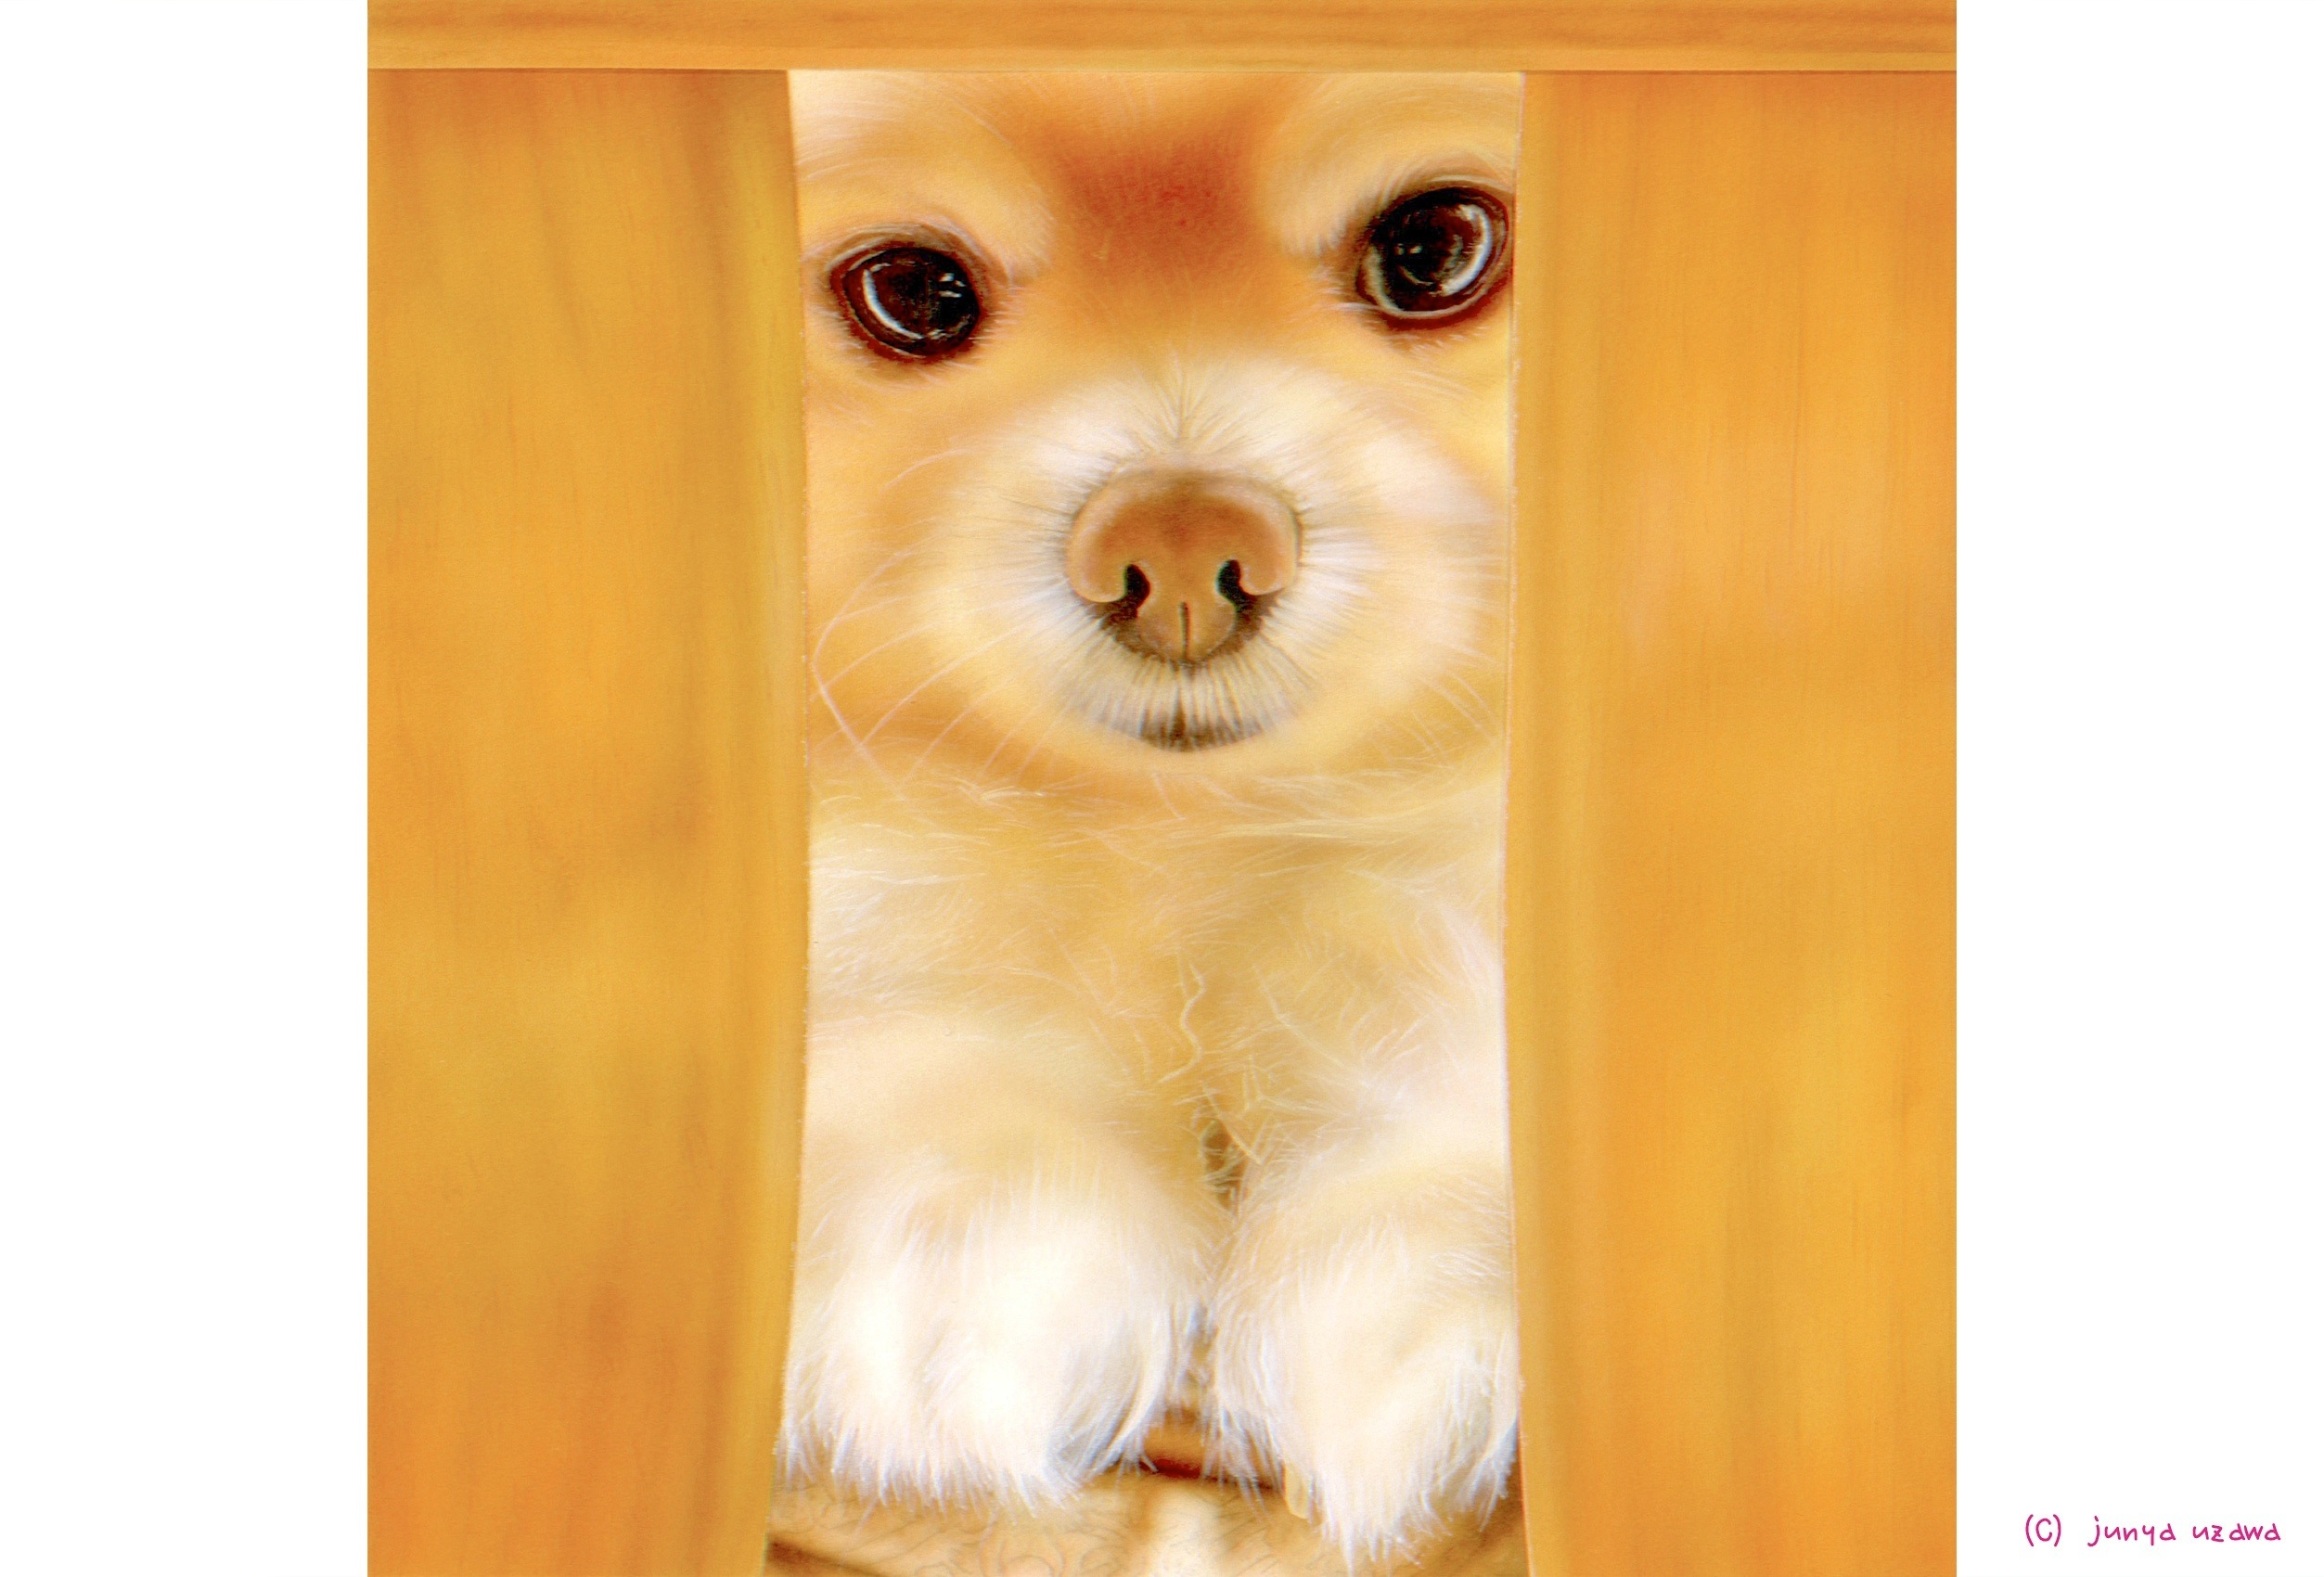 junya.blog(猫×犬)リアリズム絵画